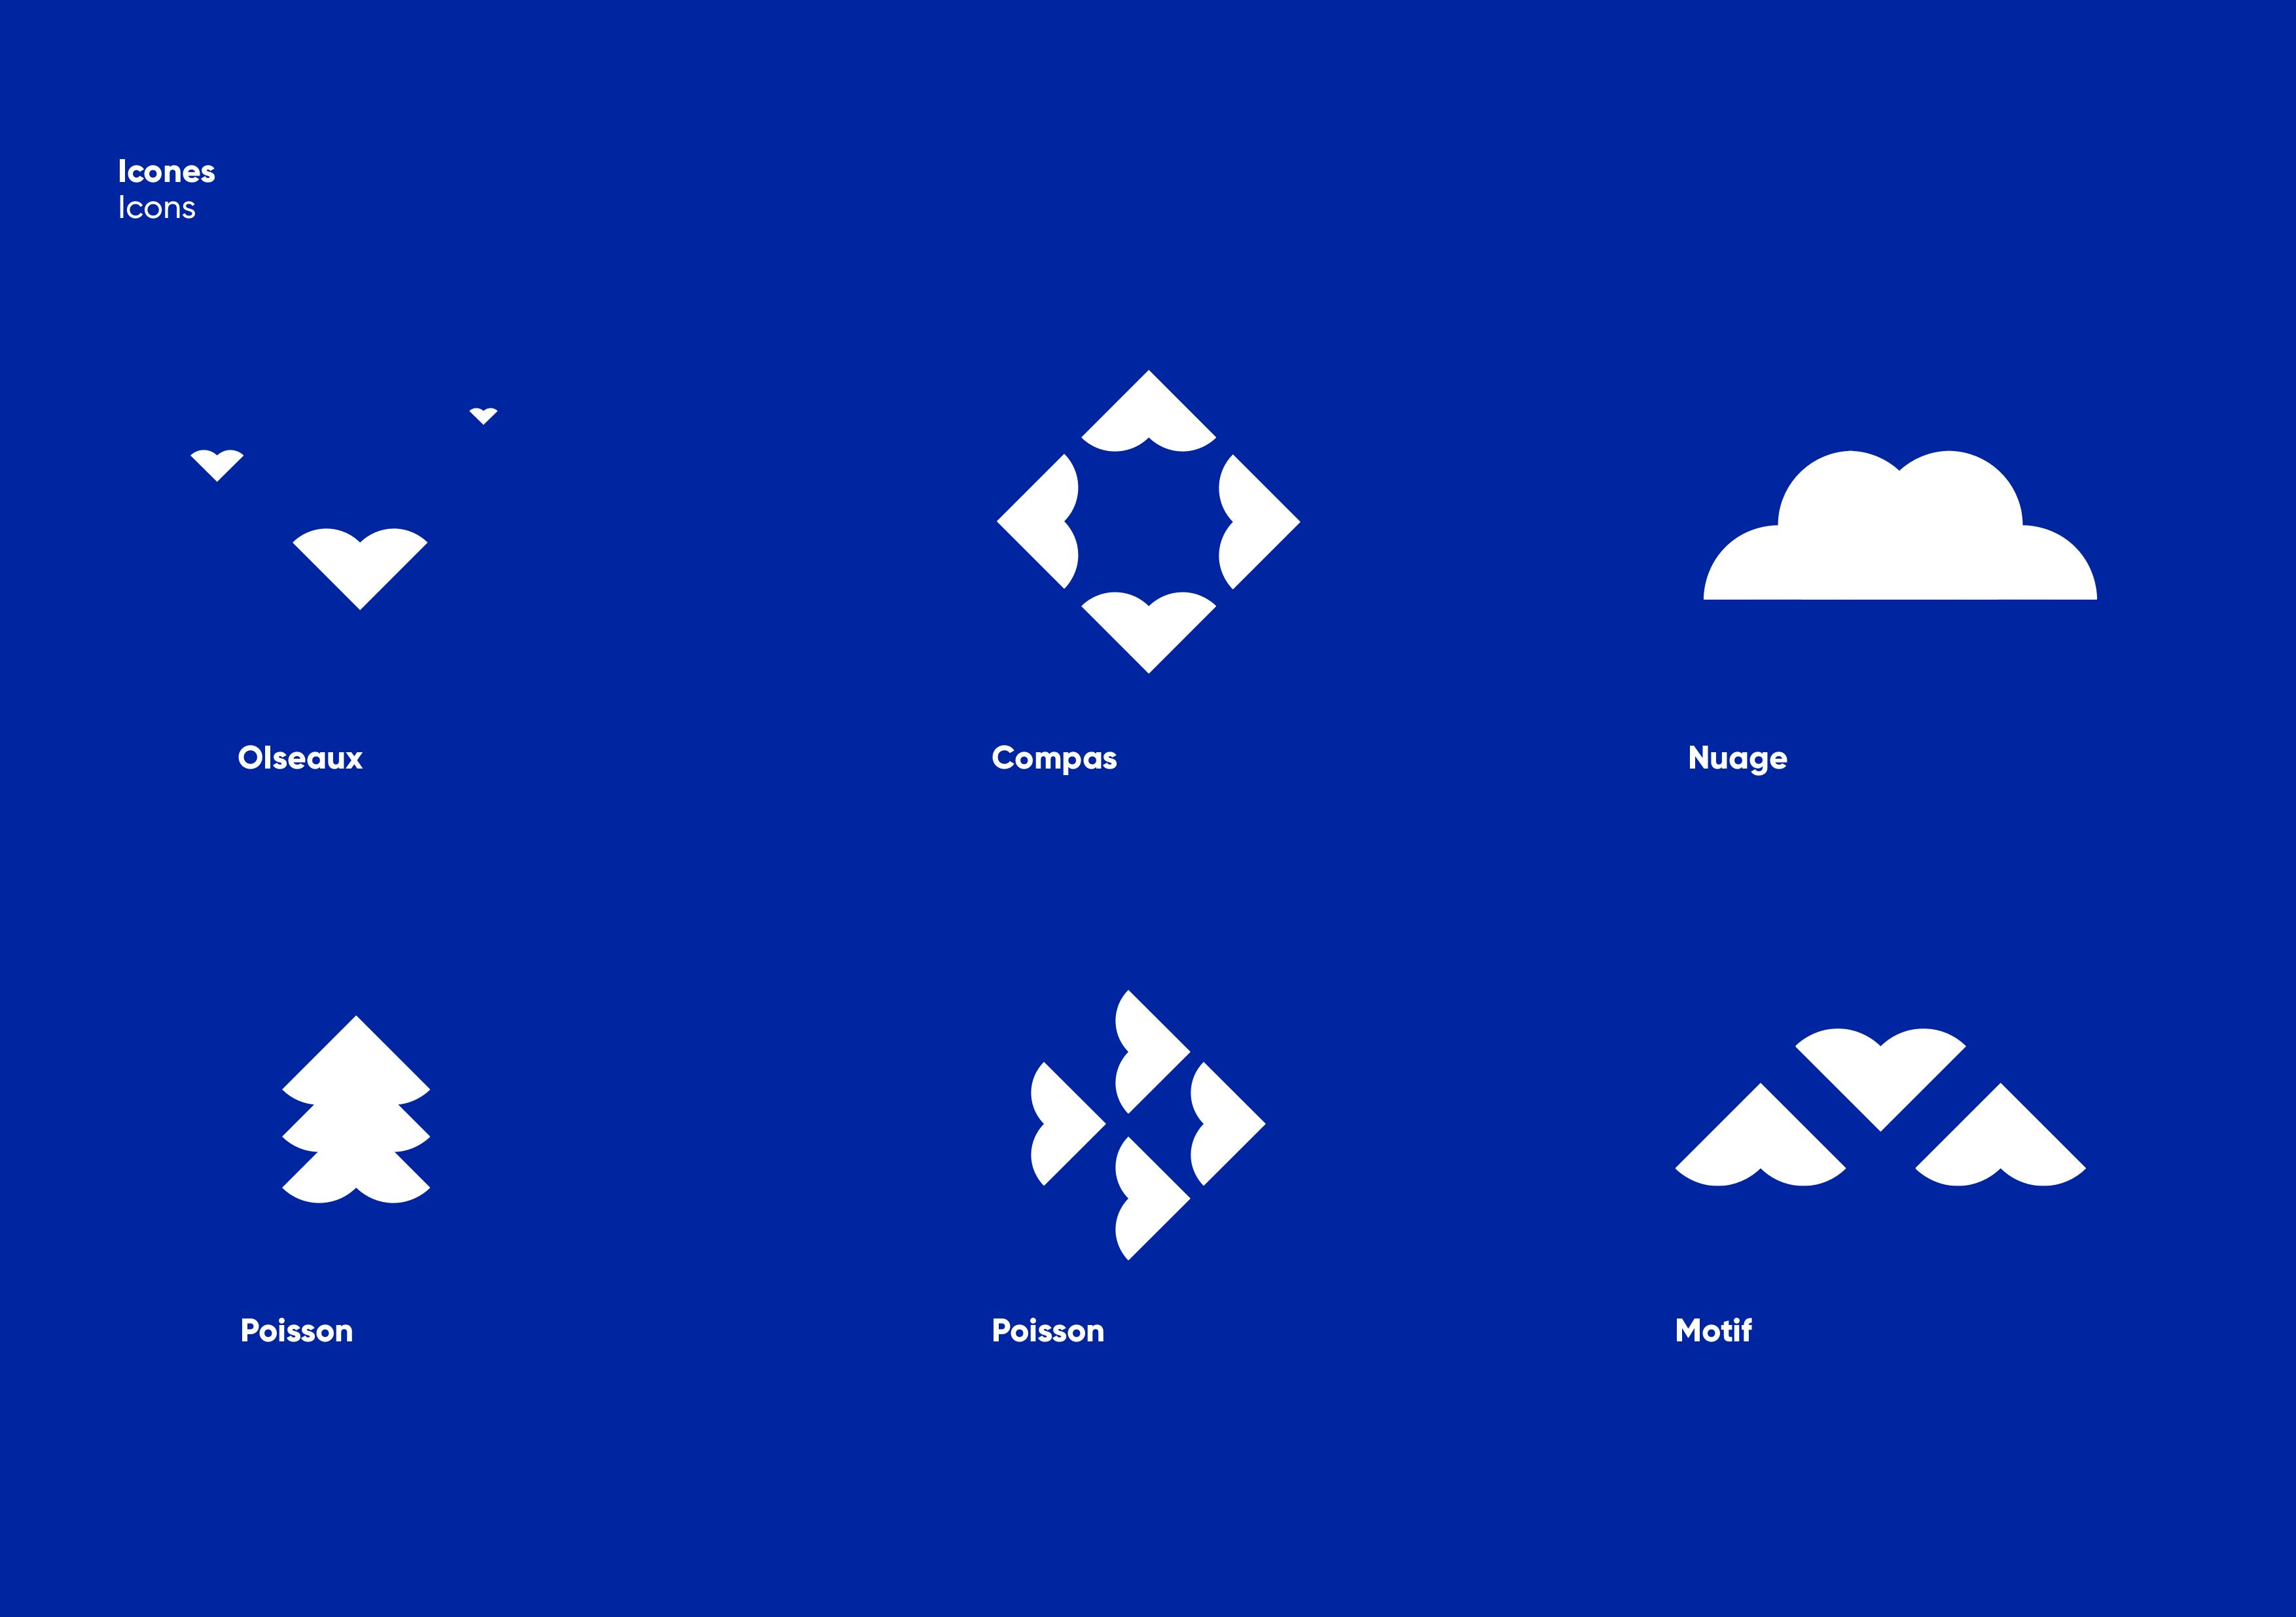 11 – Icones